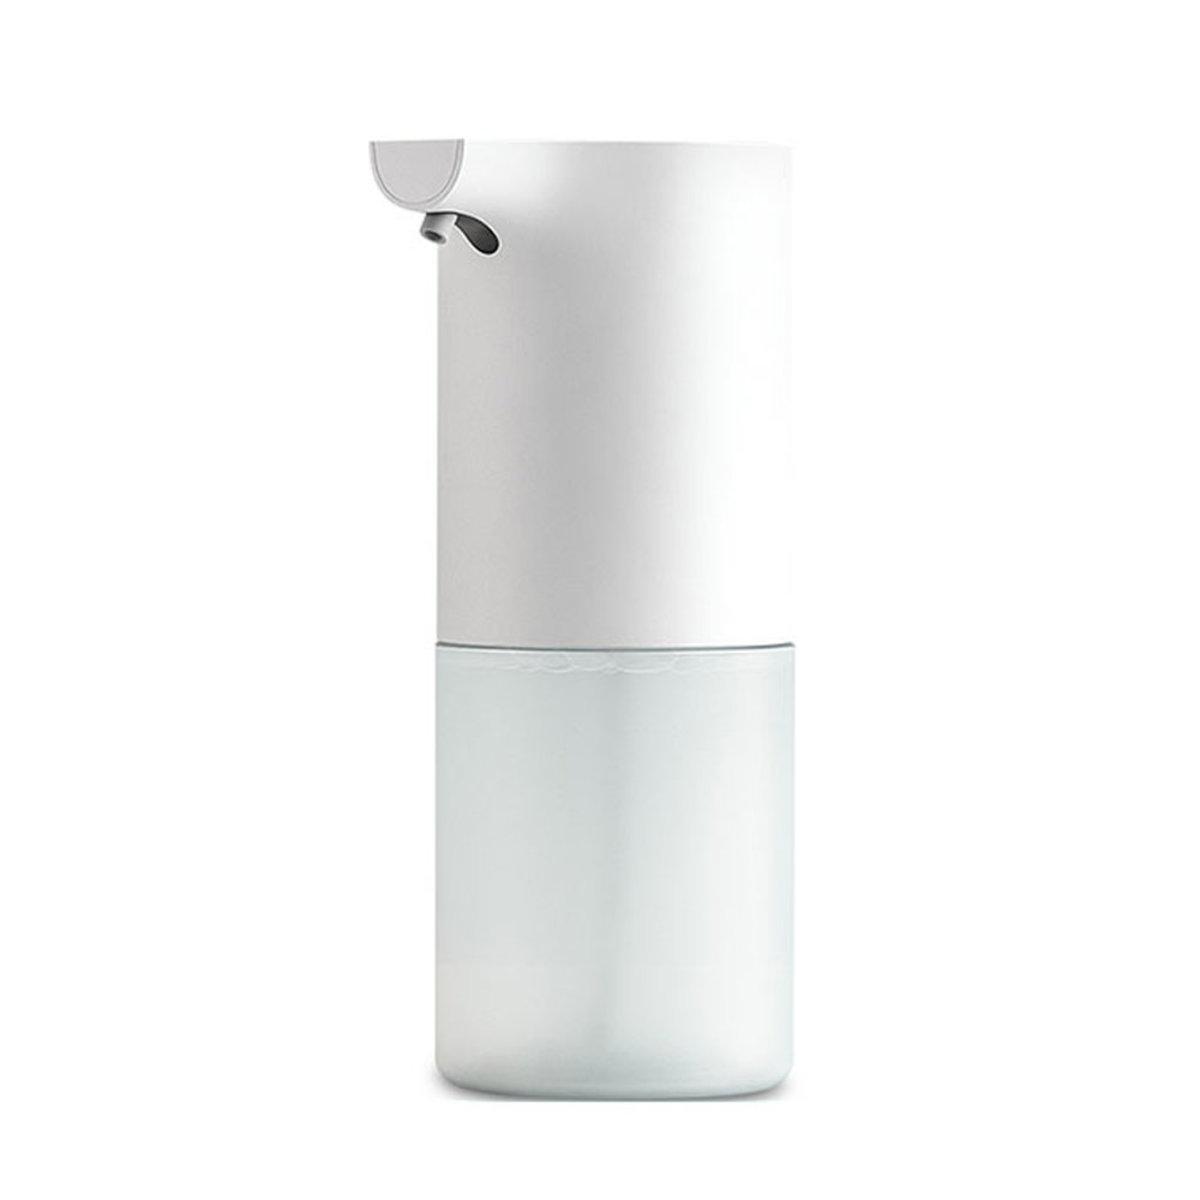 Automatic induction foam Hand washing machine